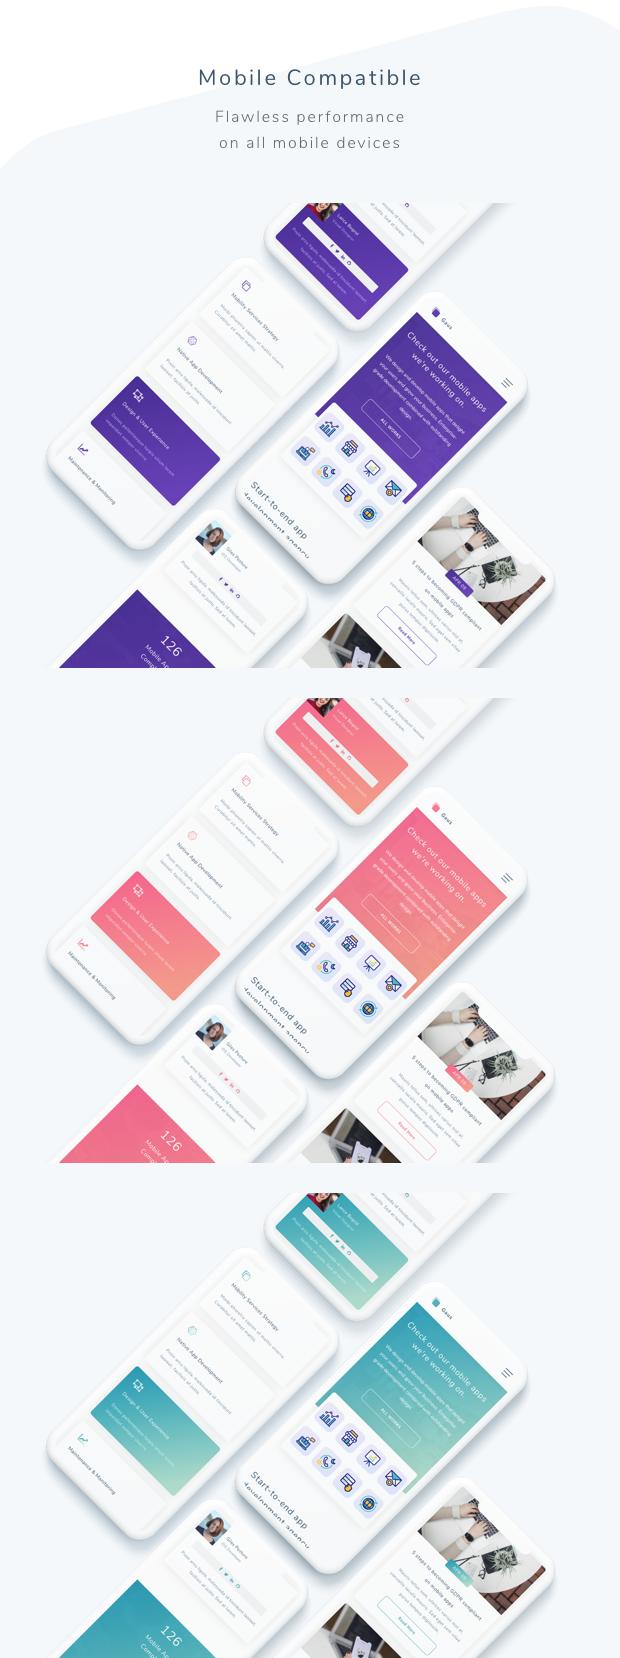 Gaus - Mobile App Development Agency Template - 2